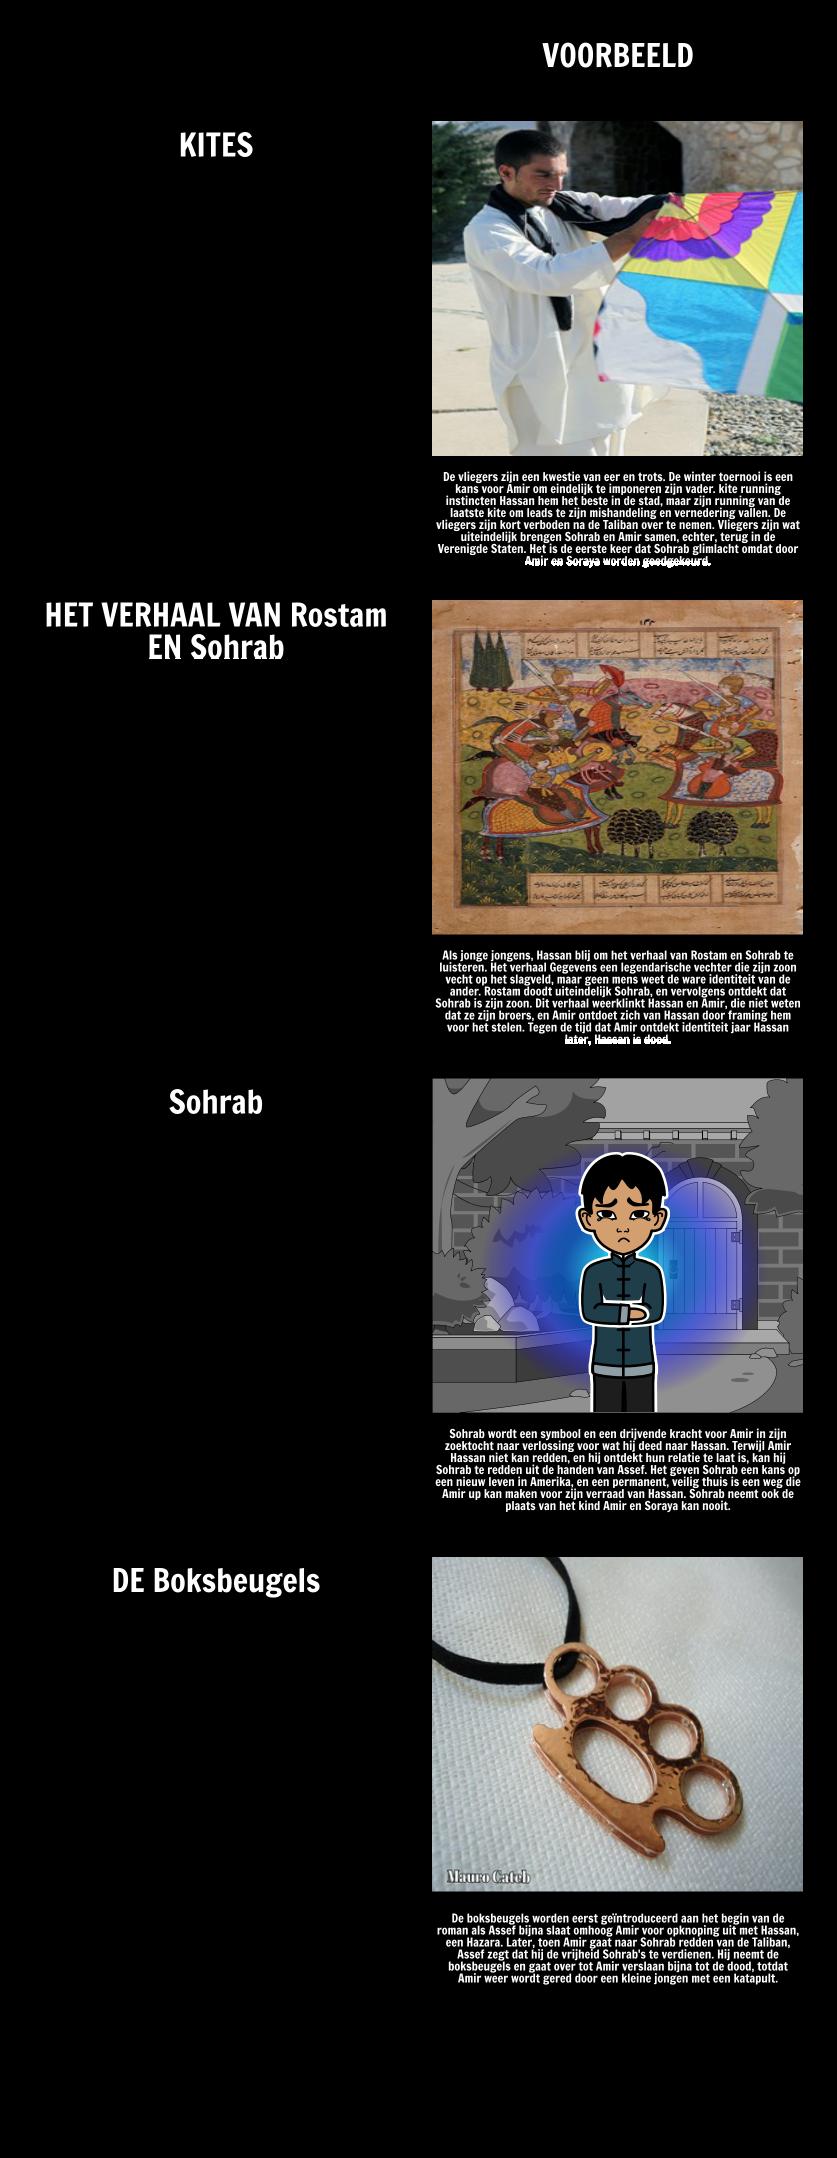 Thema's, Symbolen en Motieven in The Kite Runner